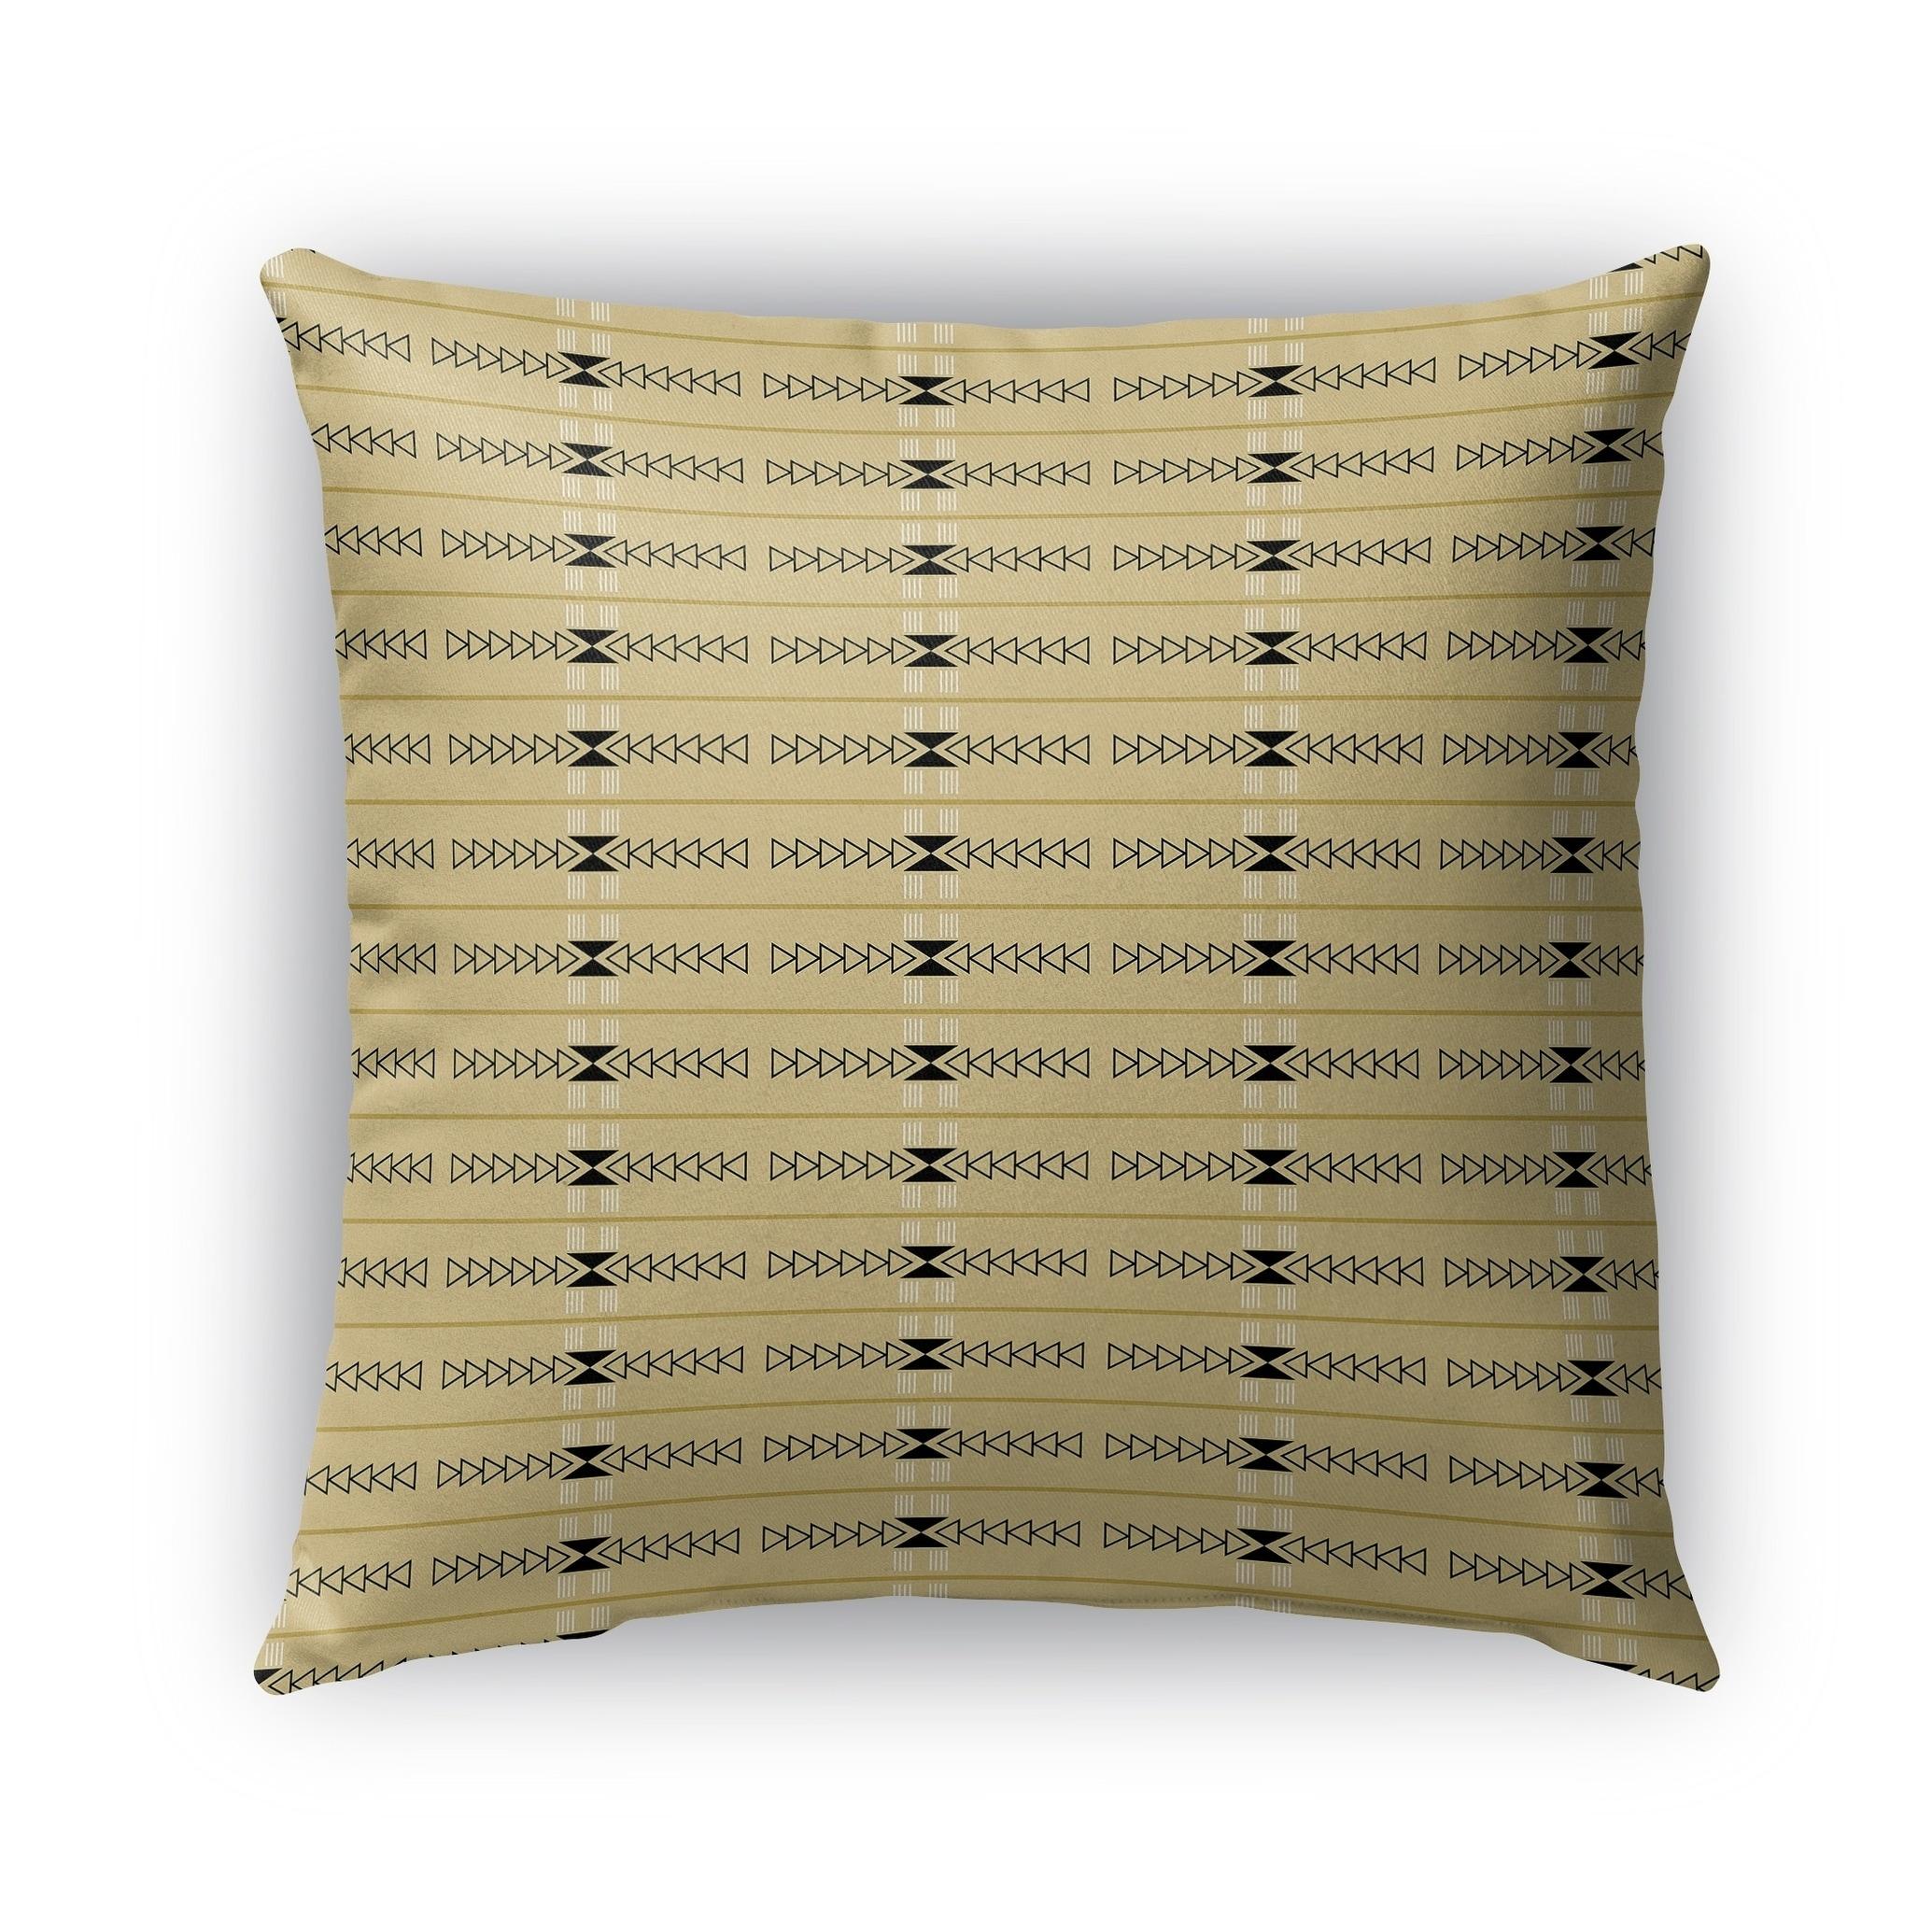 Kavka Designs yellow; grey bait outdoor pillow by terri ellis with insert (18 x 18)